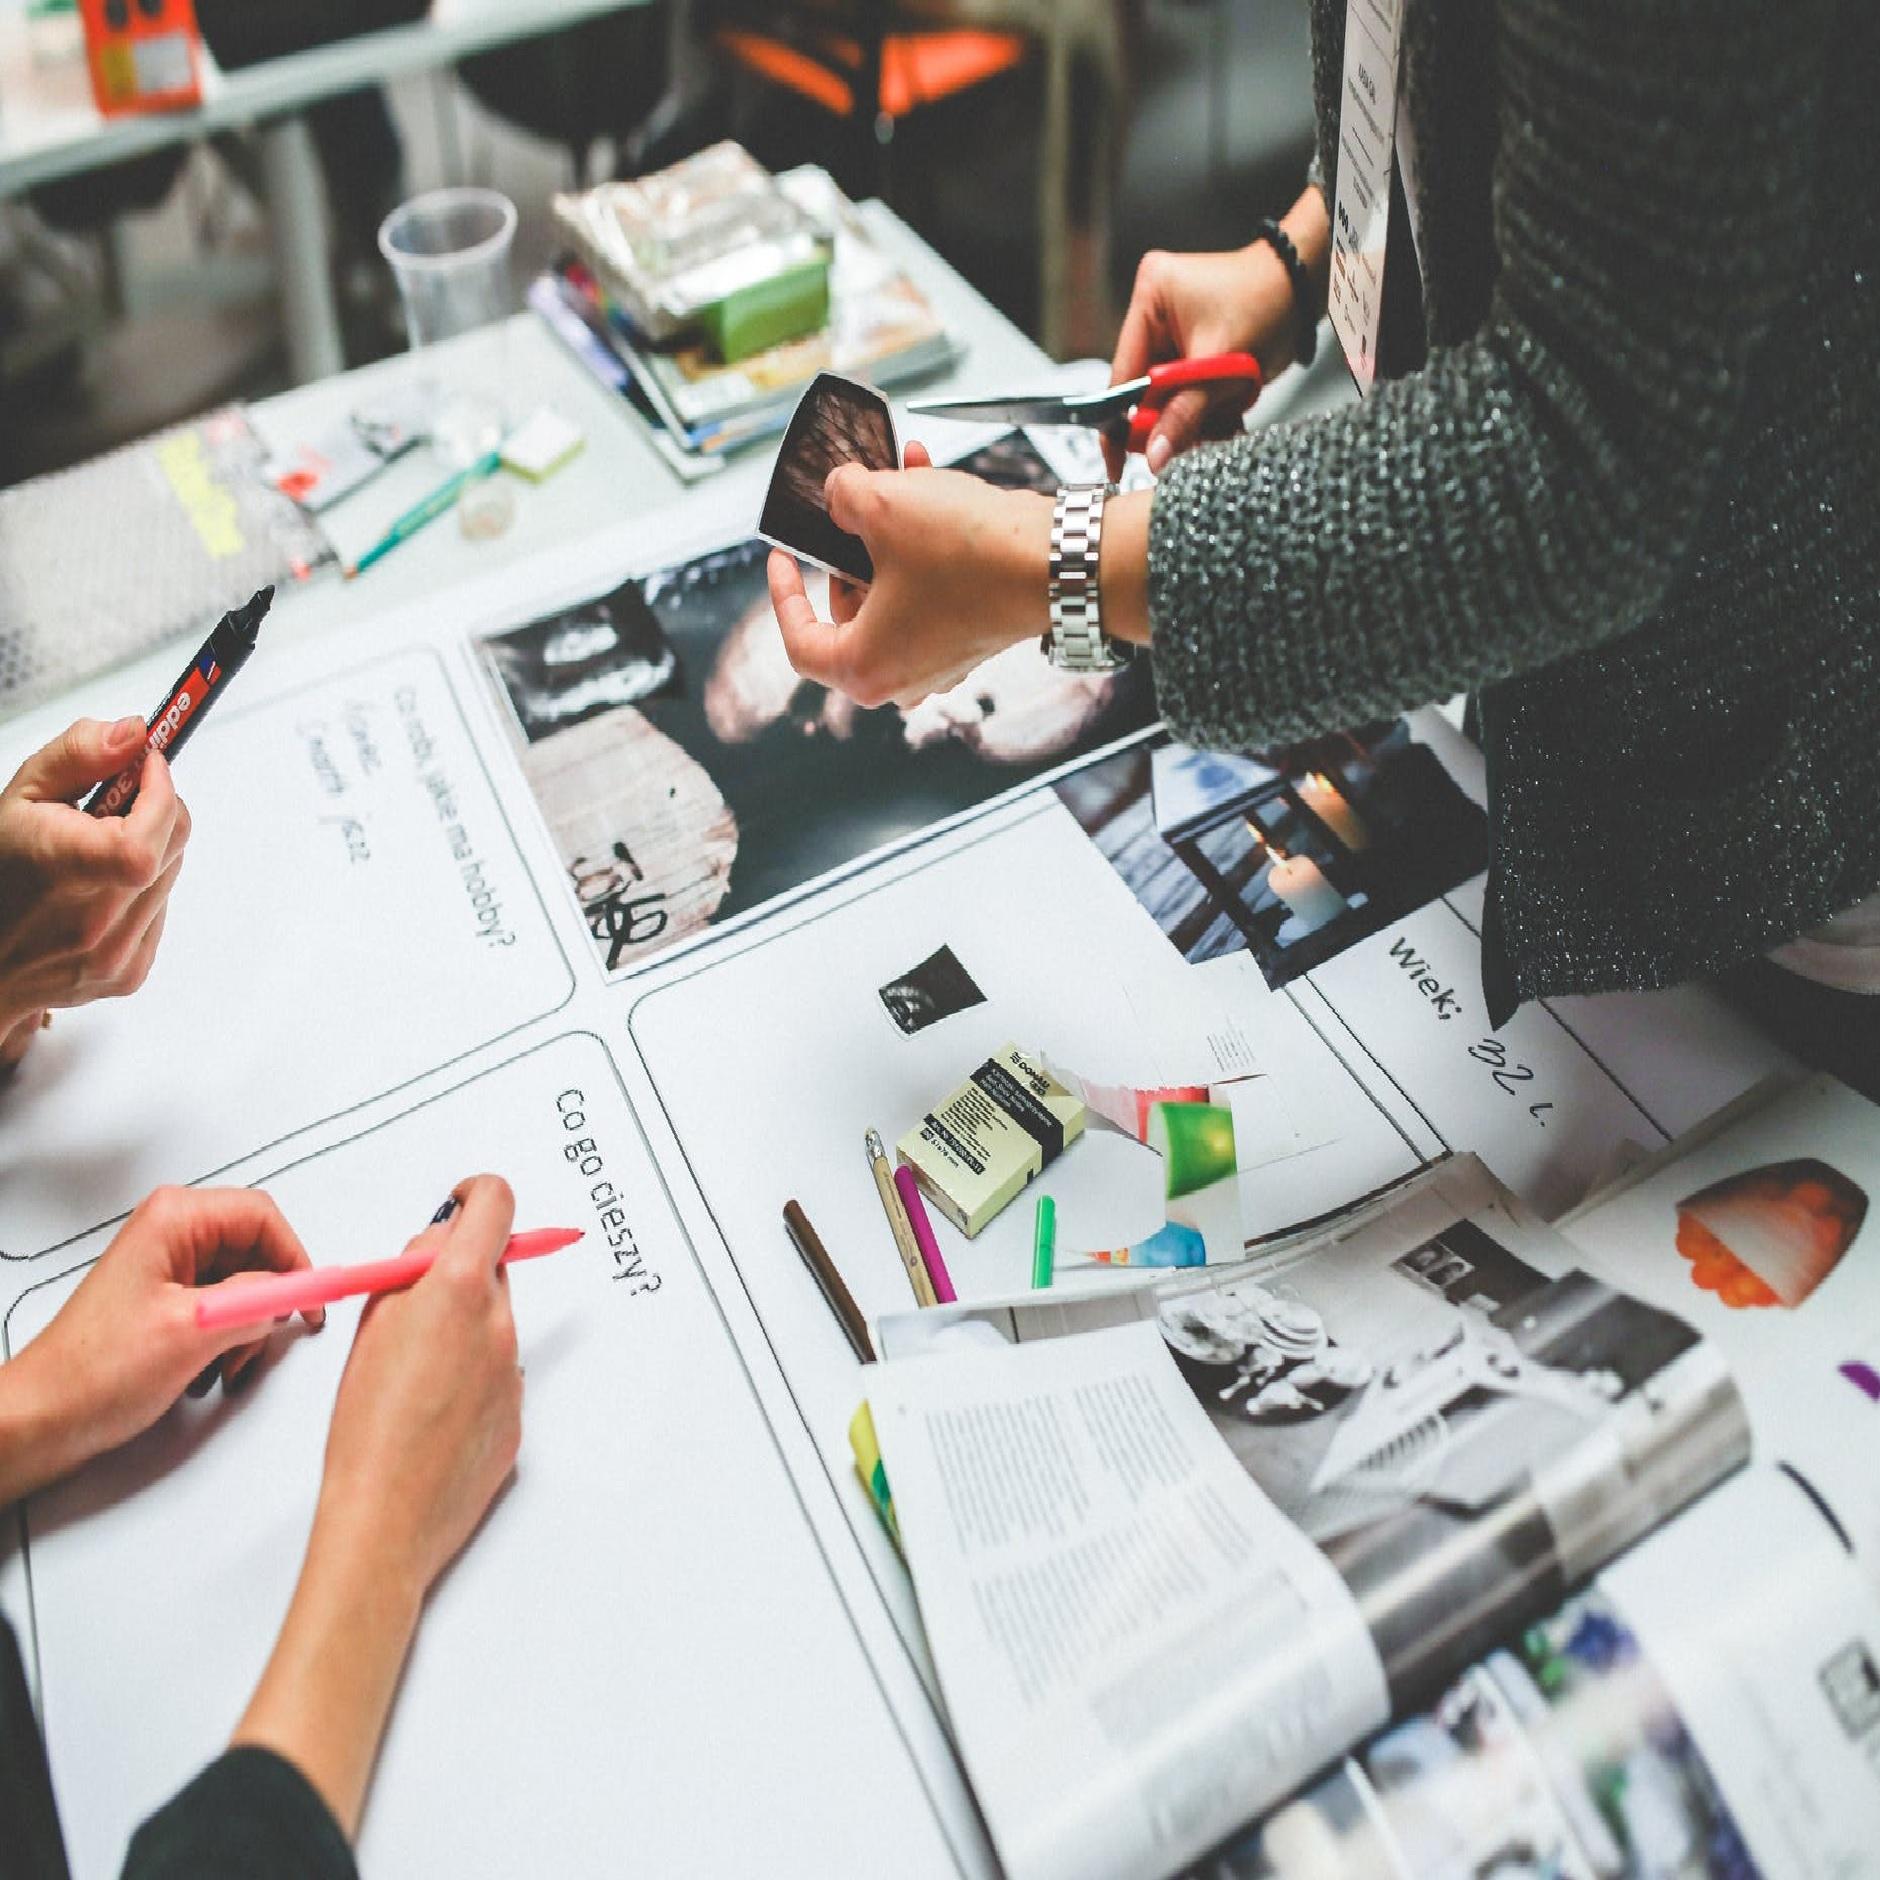 CDAF- Centrul de dezvoltare antreprenoriala a femeilor